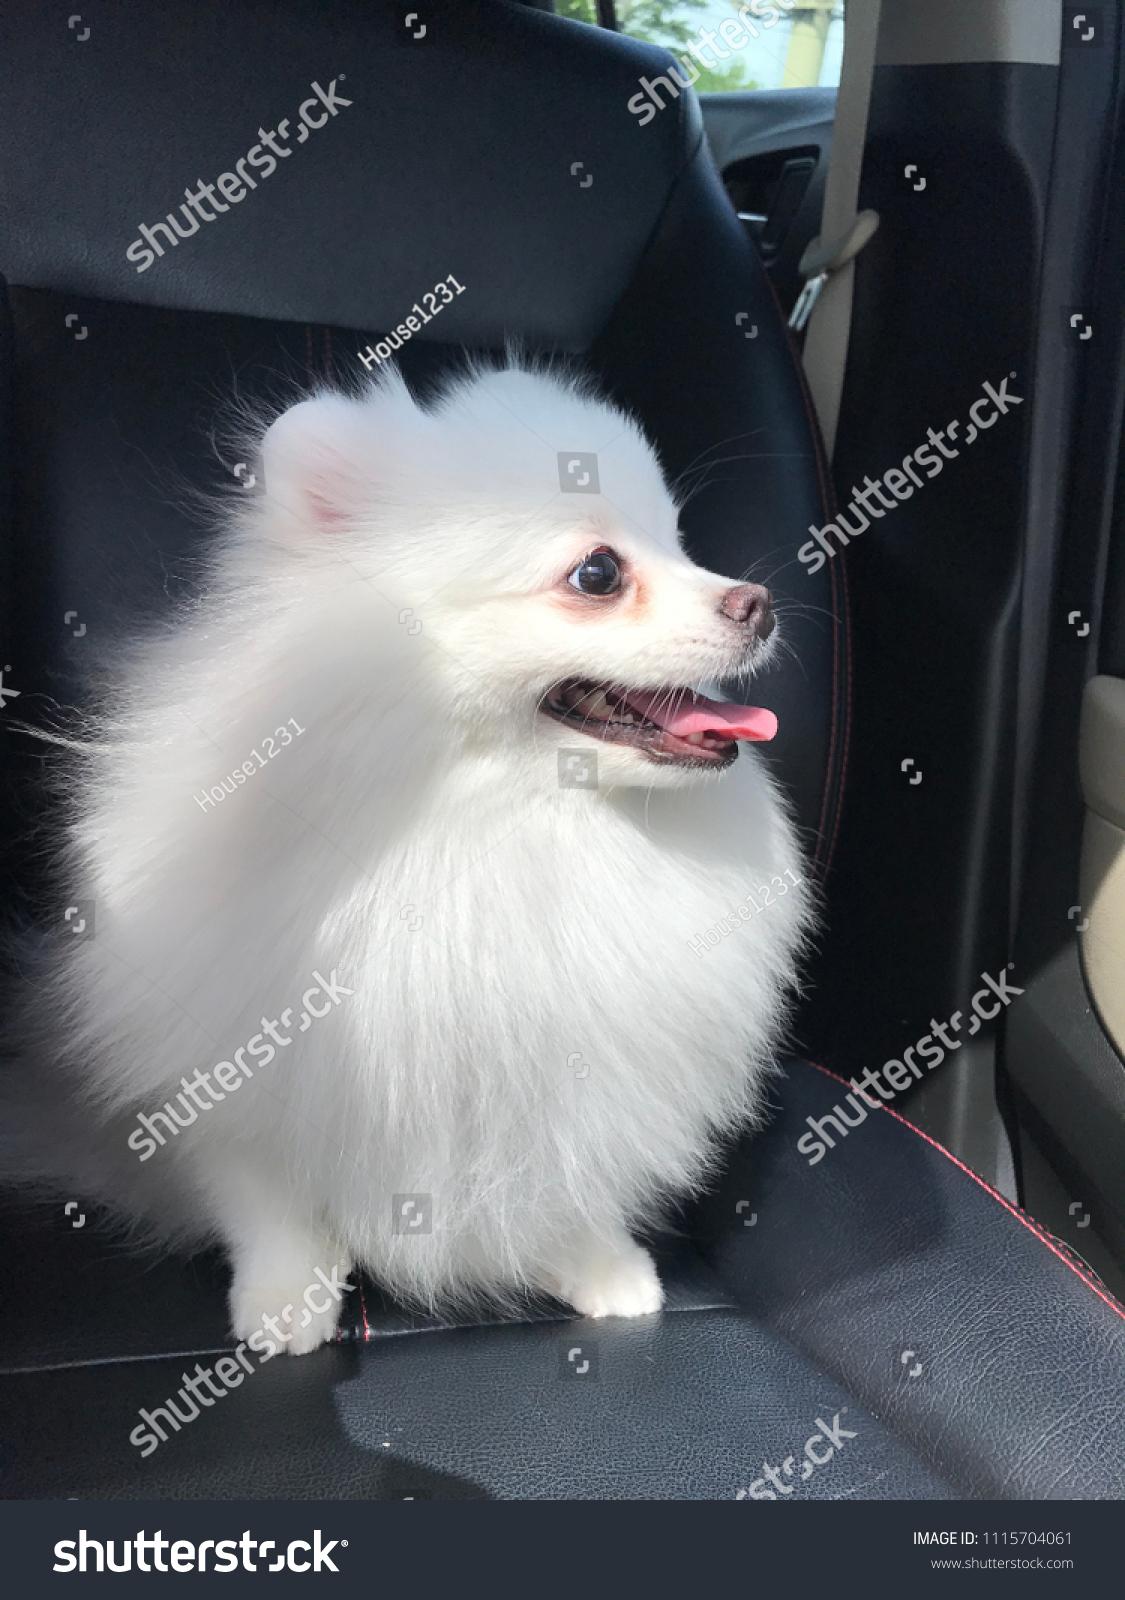 Baby Elly Pomeranian Dog Animals Wildlife Stock Image 1115704061